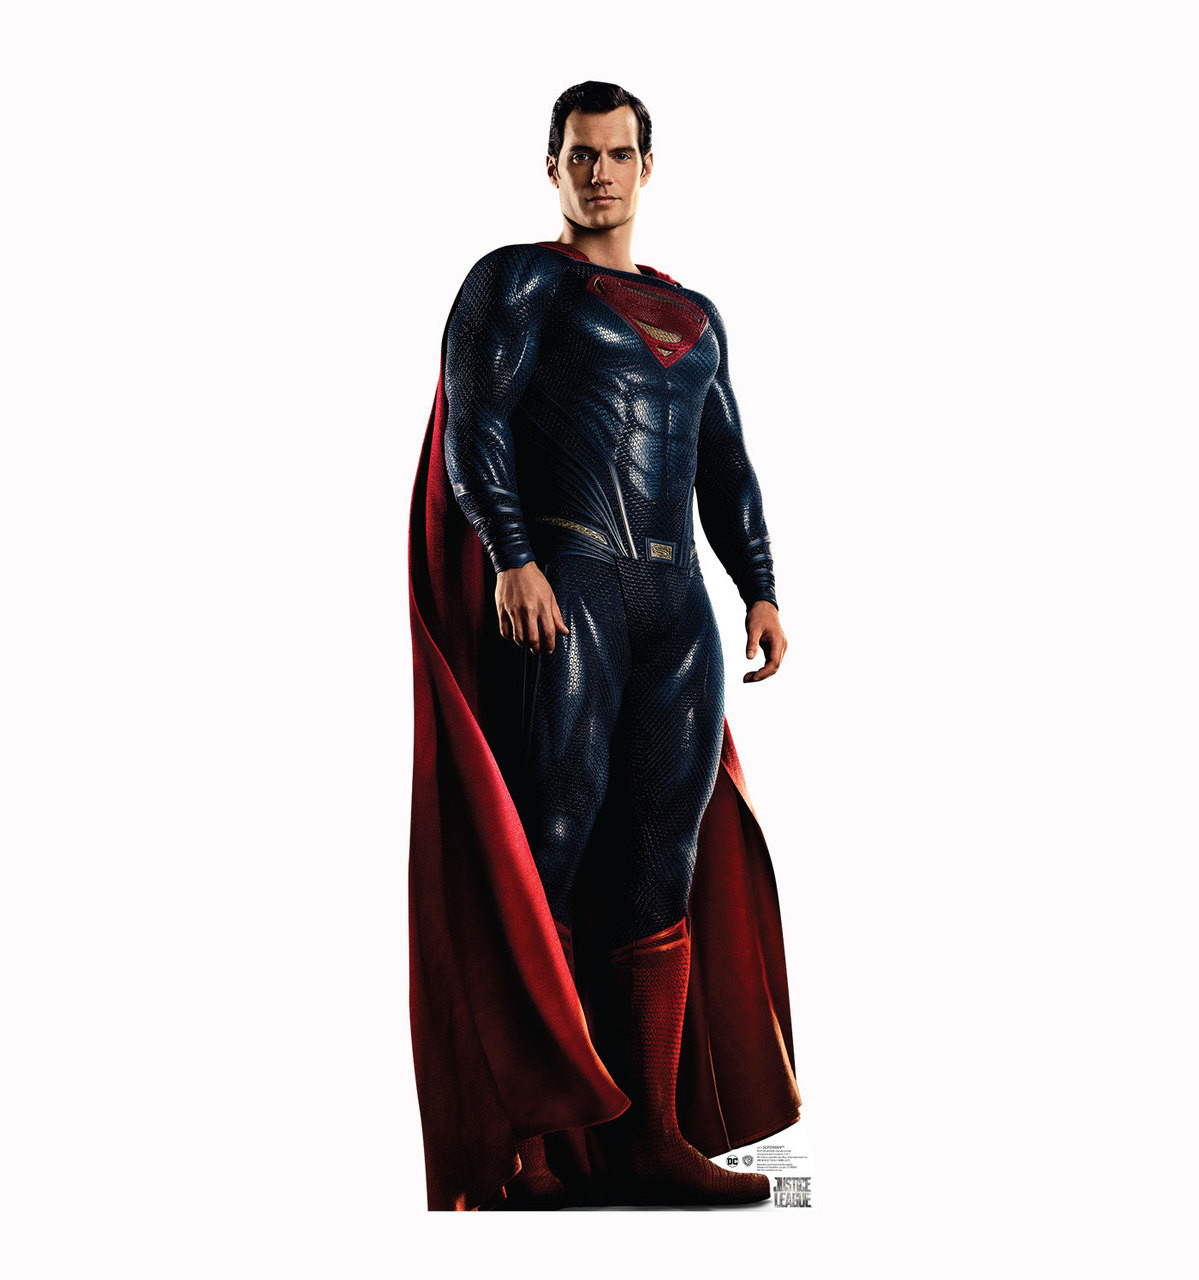 Superman (Justice League) Life-Size Cardboard Standup